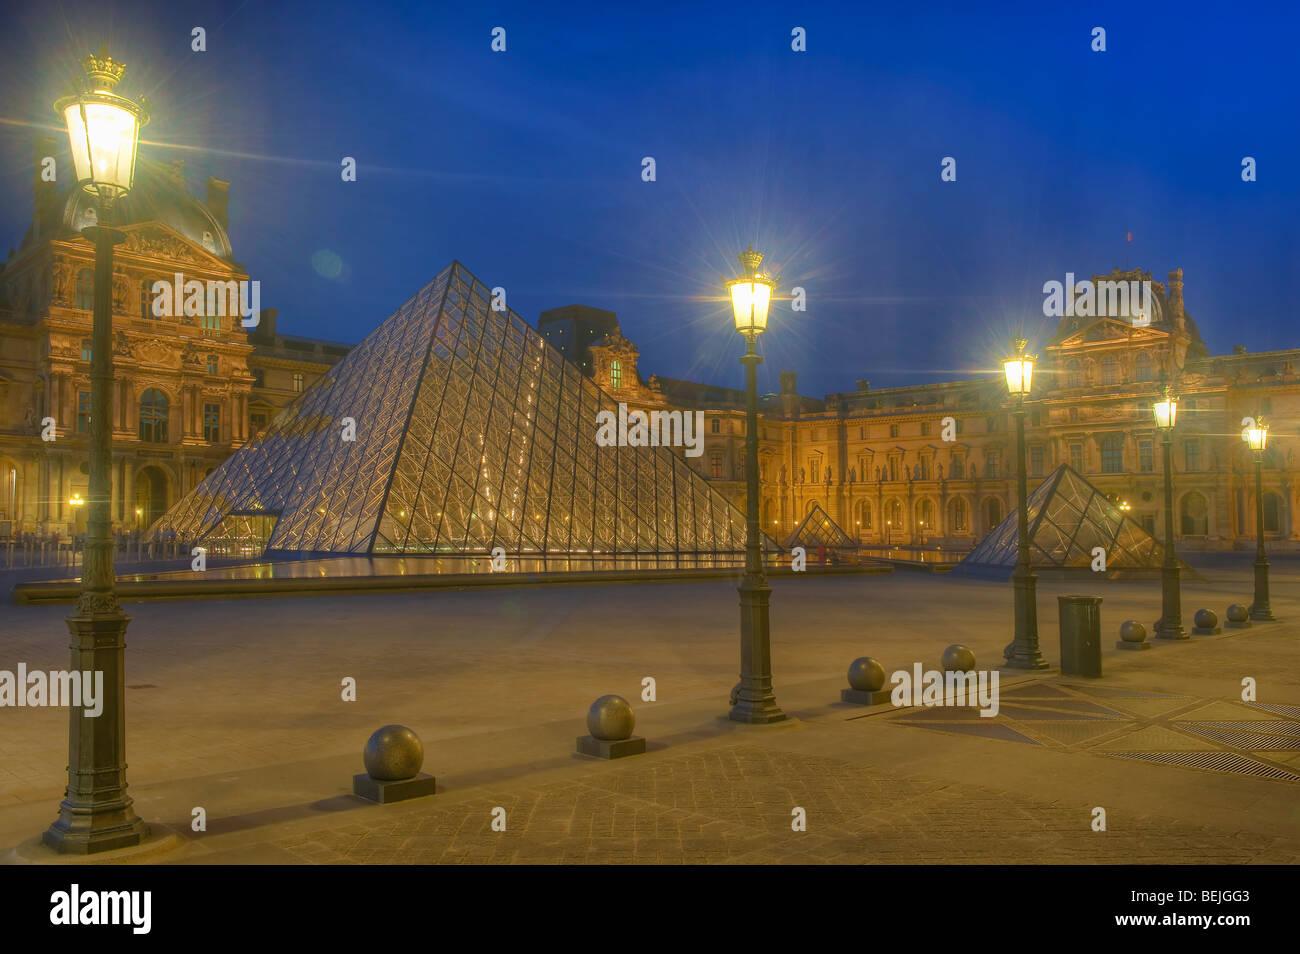 Louvre Pyramide at sunset, Paris, France - Stock Image